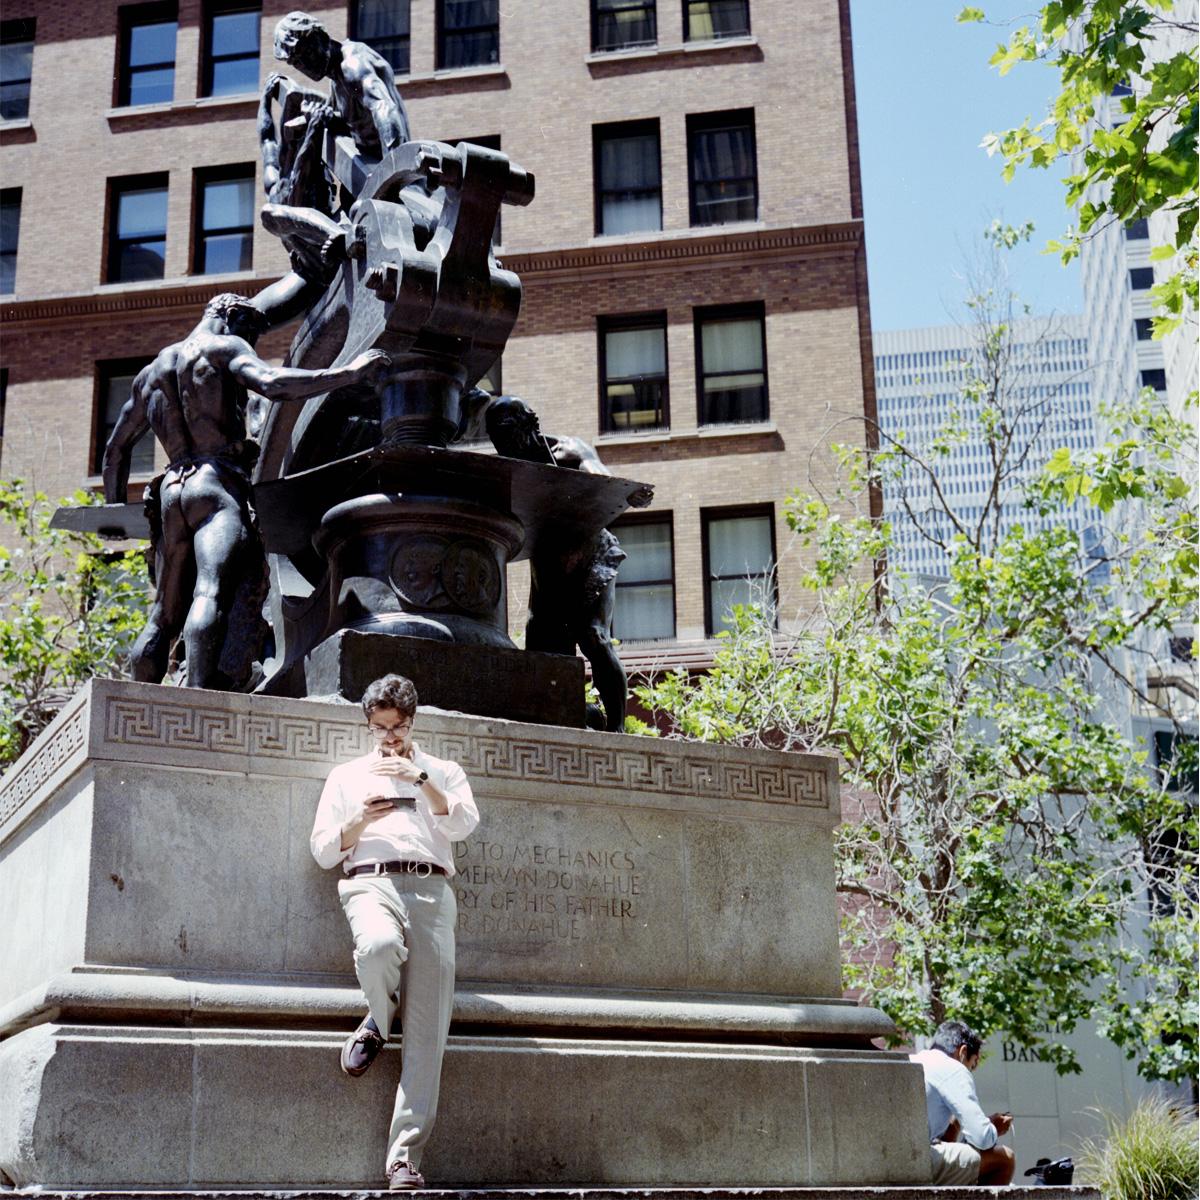 Man on a Phone Against Mechanics Monument